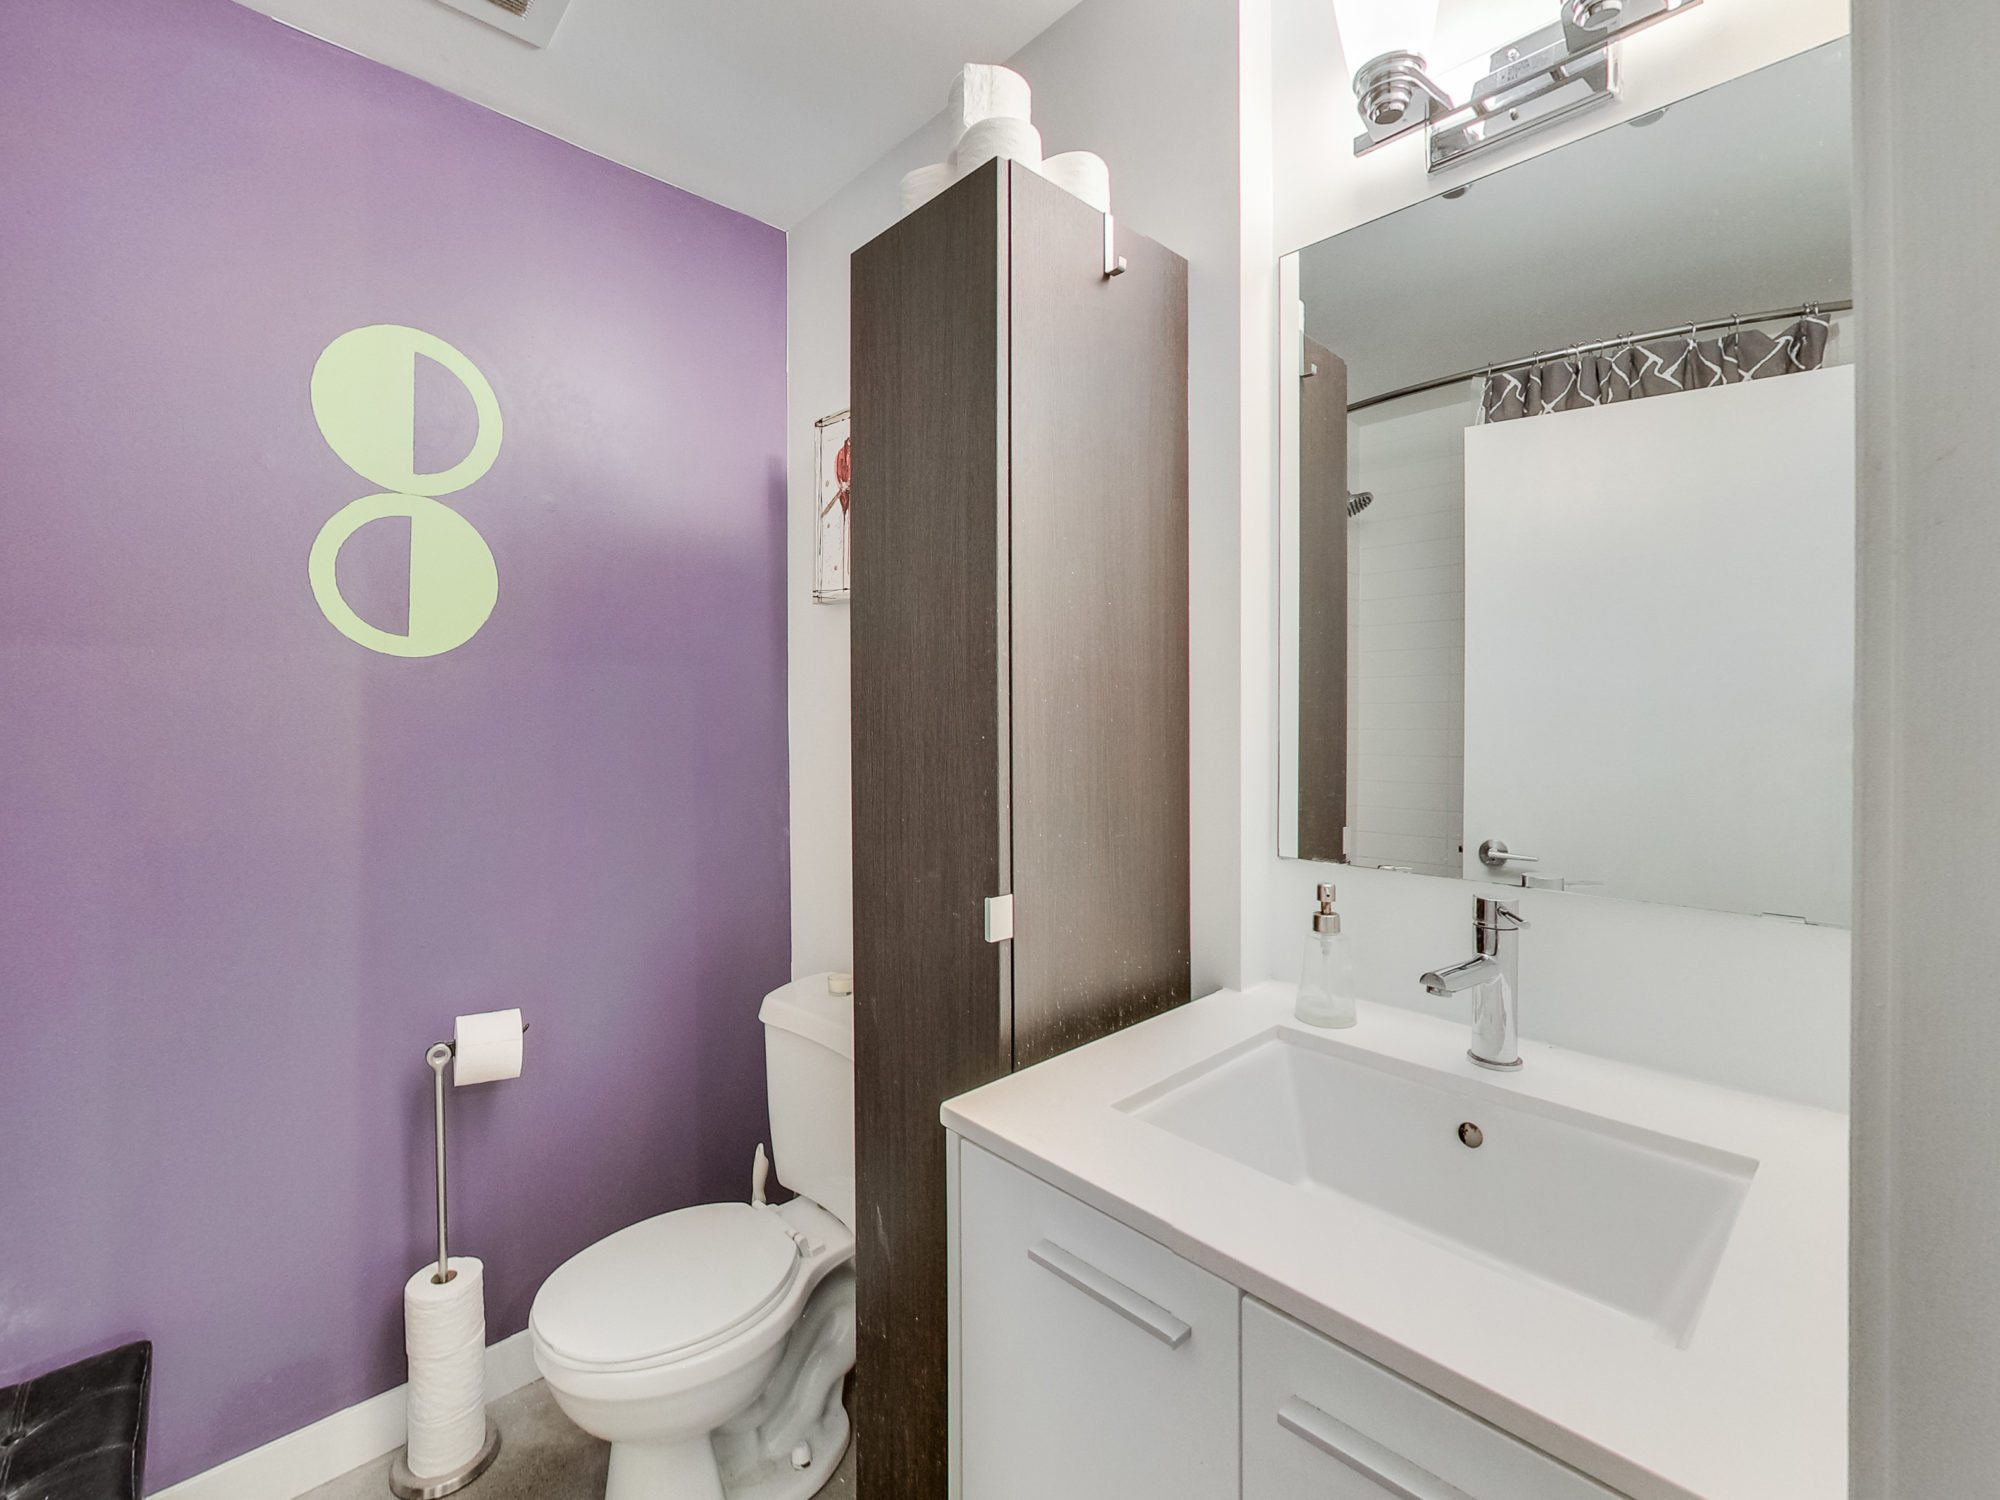 toronto-real-estate-condo-of-the-week-52-sumach-street-bathroom